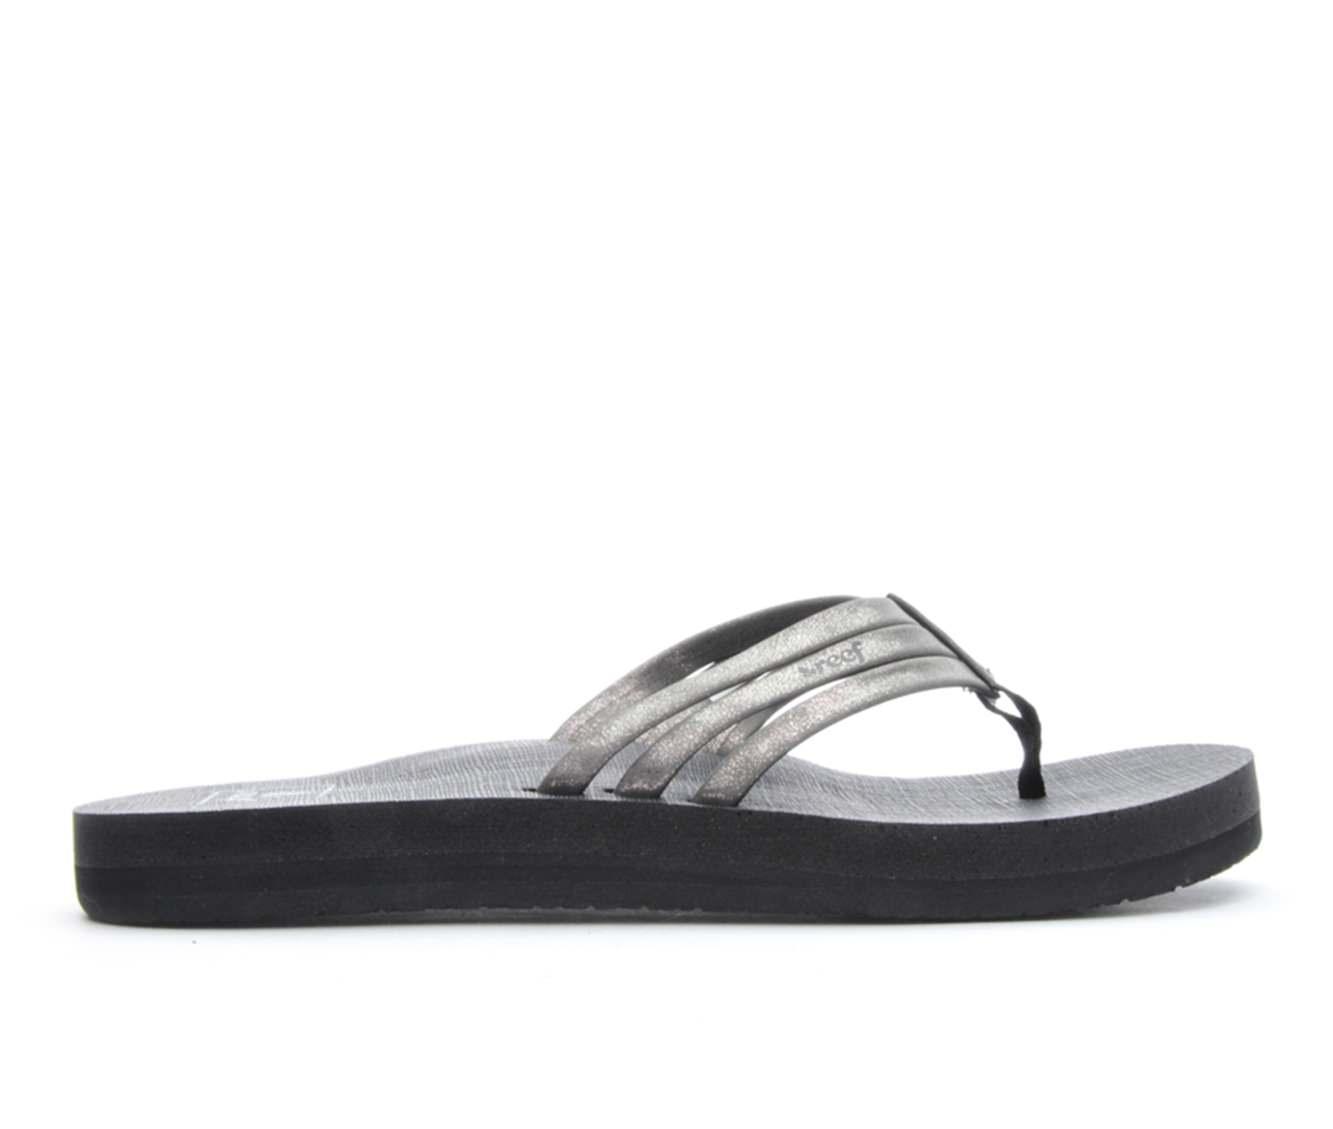 73a38b37c8f5 Women s Reef Star Shine Sandals (Grey)